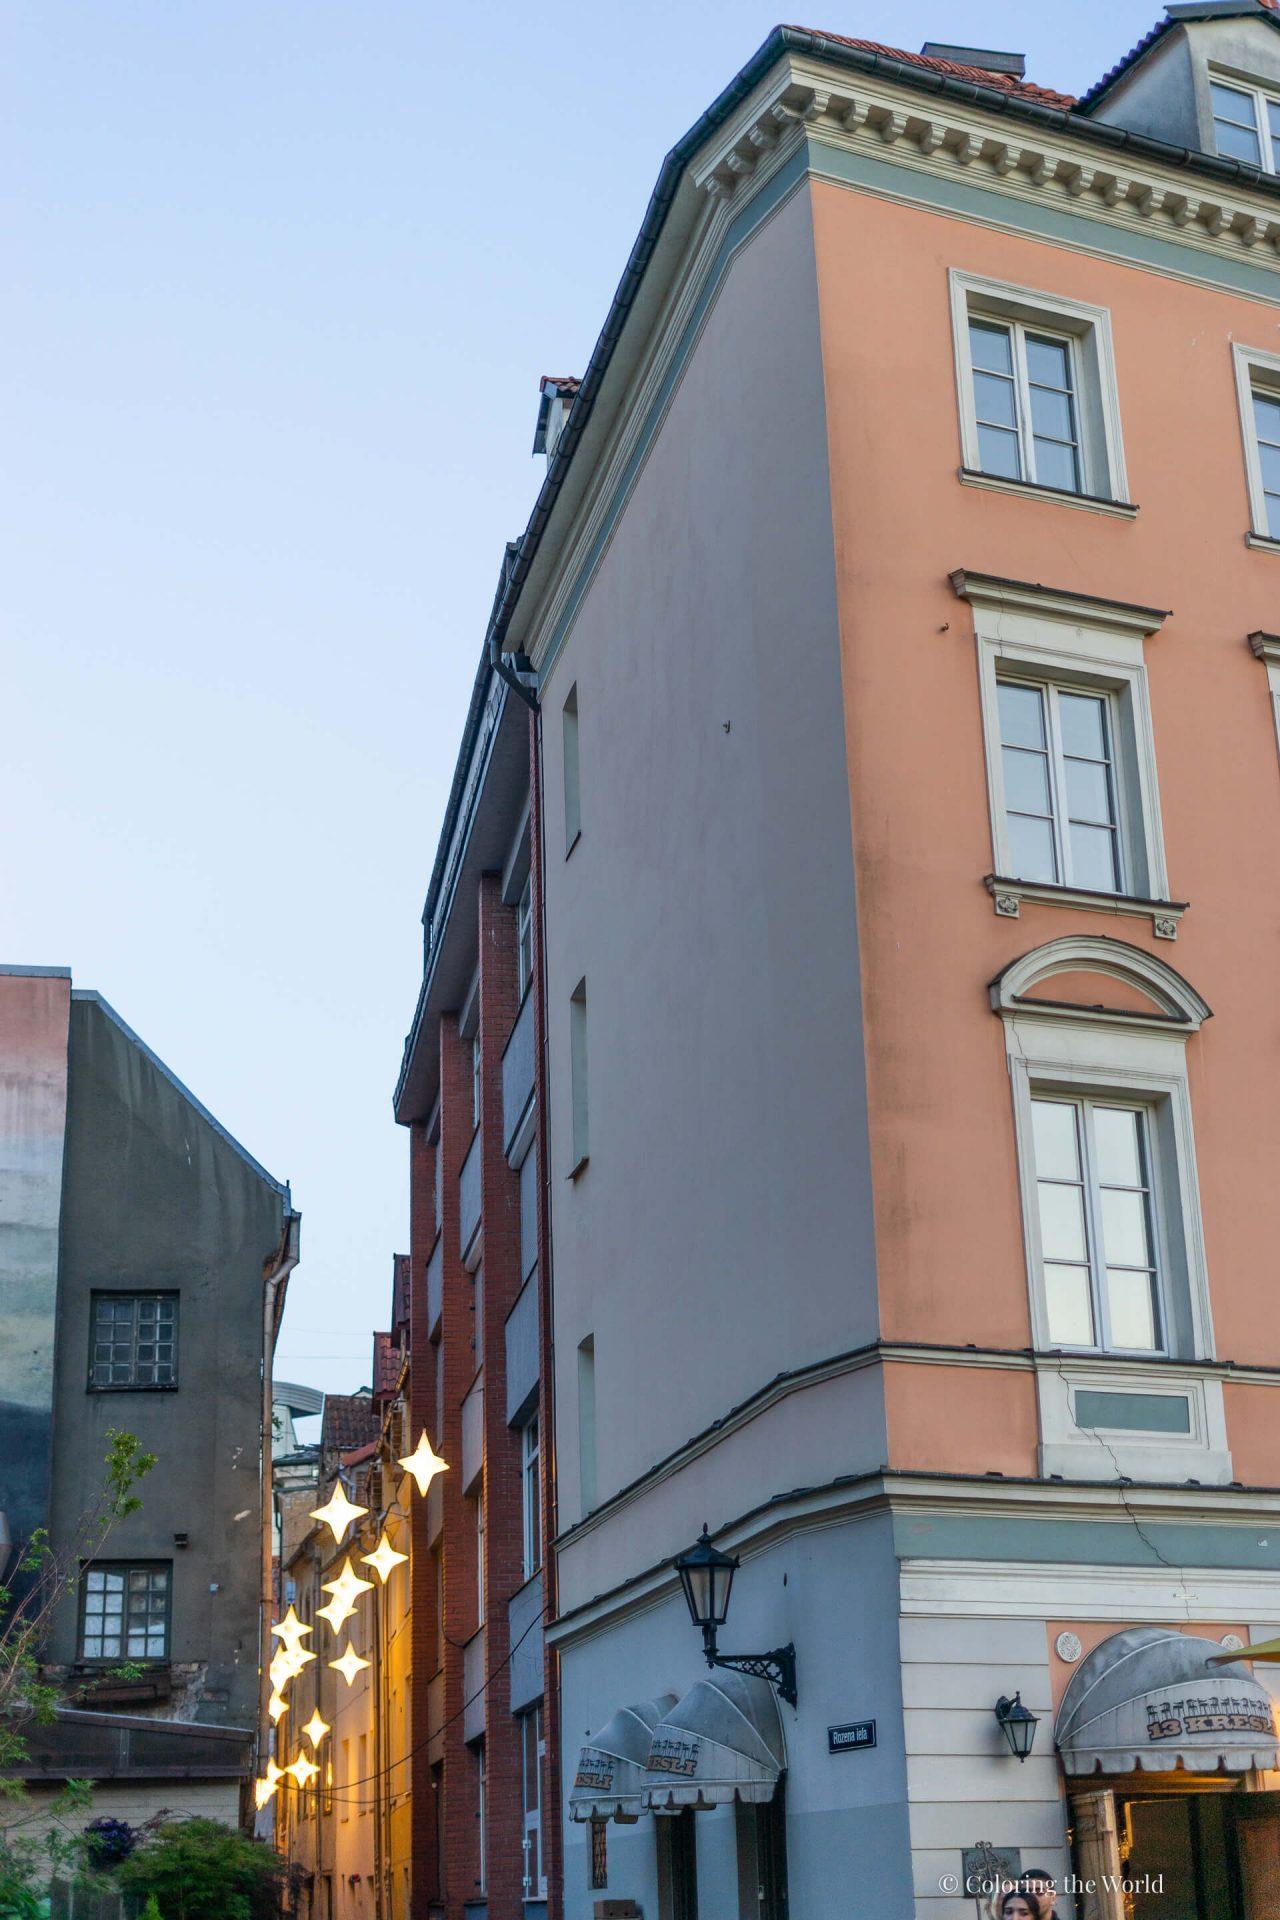 Rakennus Riian vanhassakaupungissa